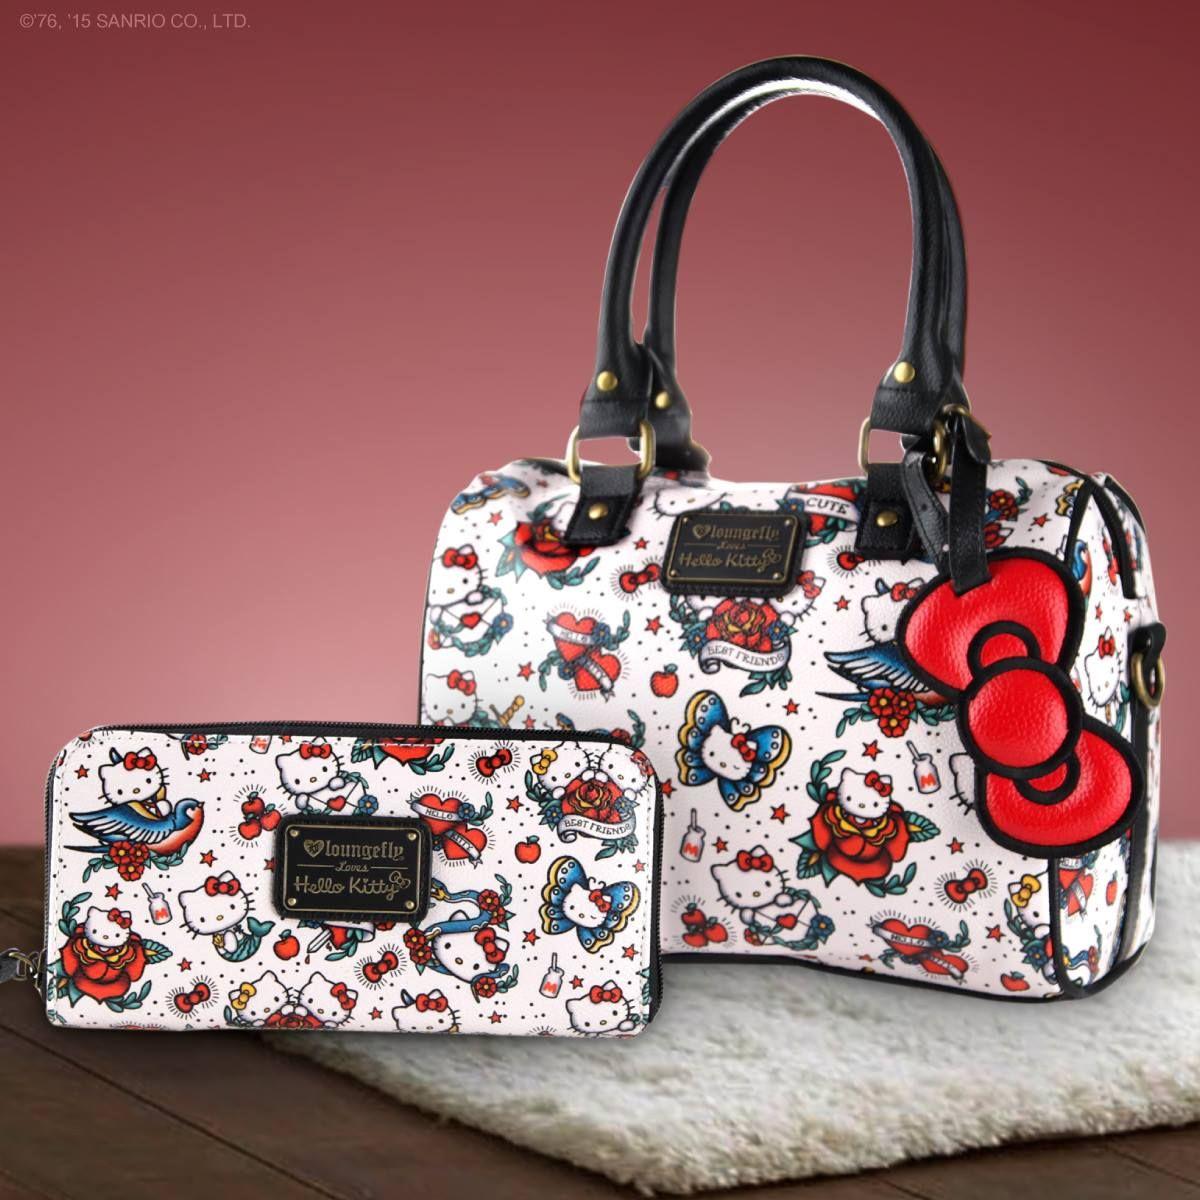 HELLO KITTY /& FRIENDS 40TH ANNIVERSARY GIRL/'S PURSE CANVAS SHOULDER BAG NWT!